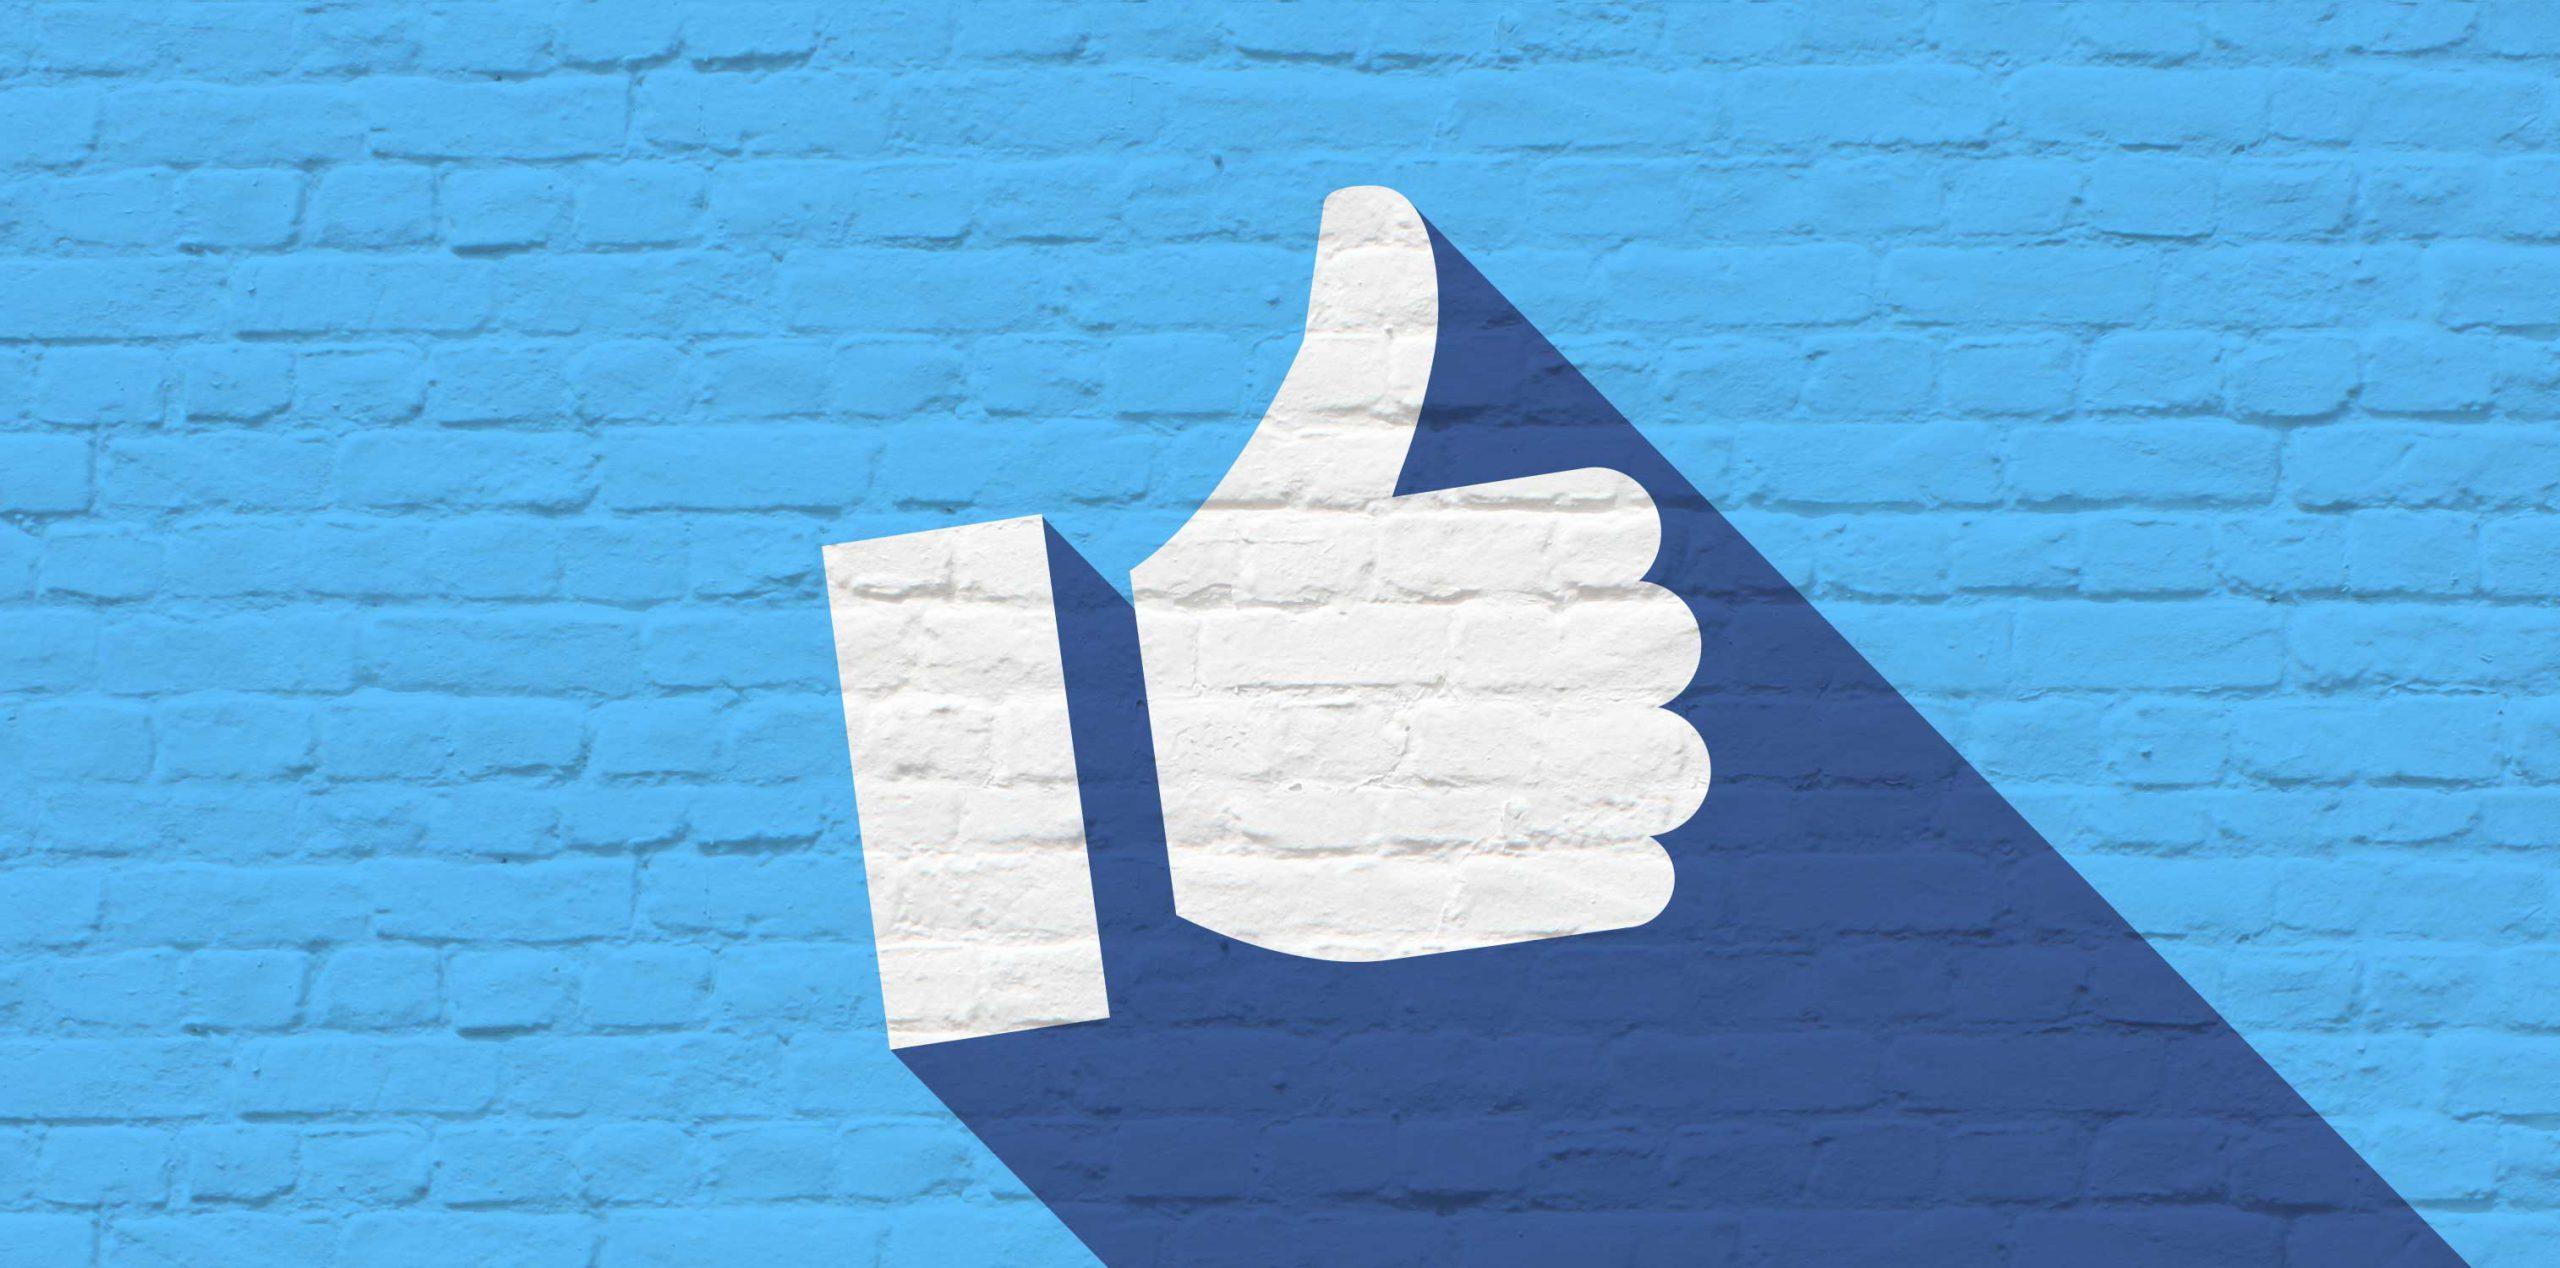 Comment inviter mes amis à aimer ma page Facebook entreprise?